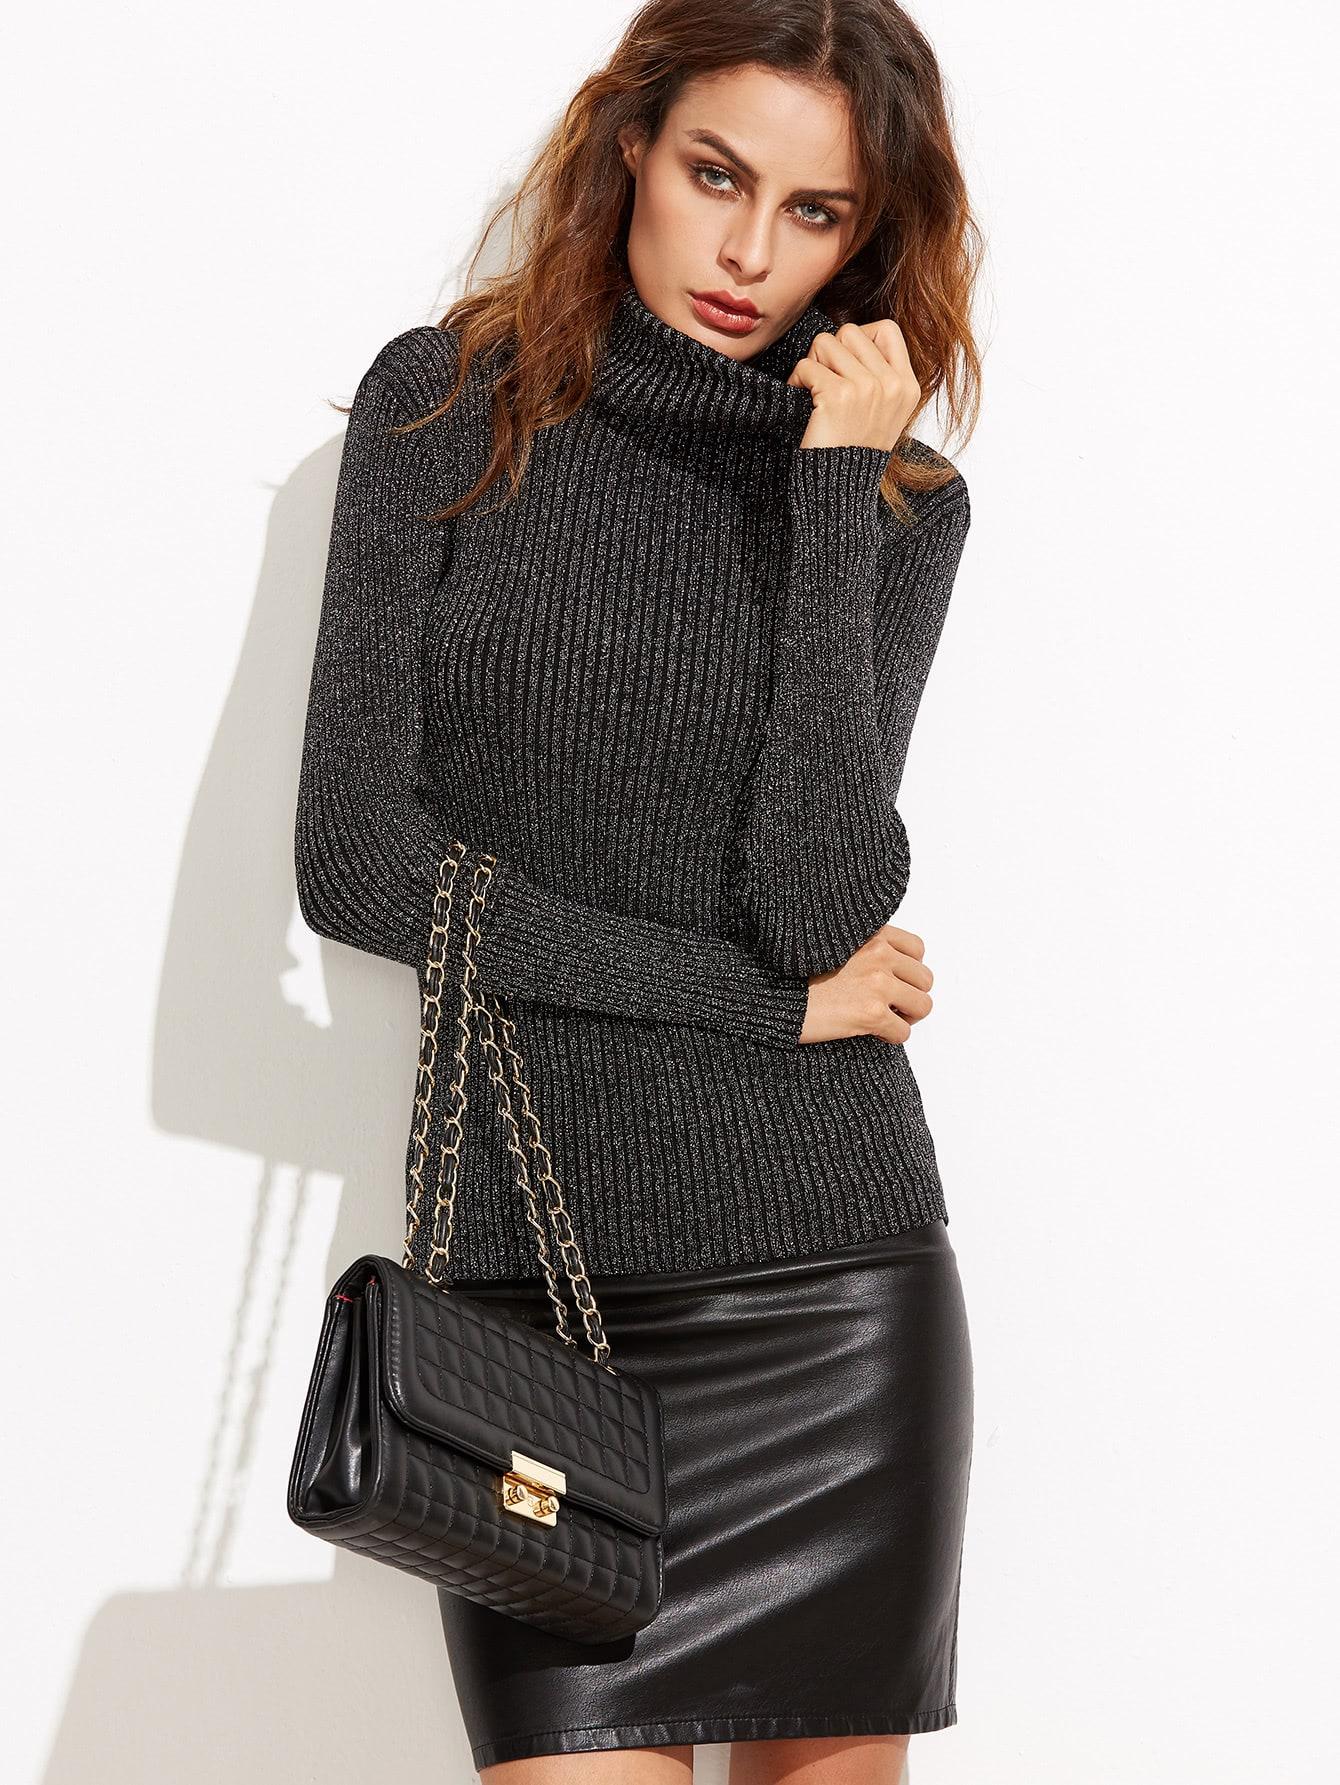 Black Turtleneck Ribbed Sweater sweater160919001